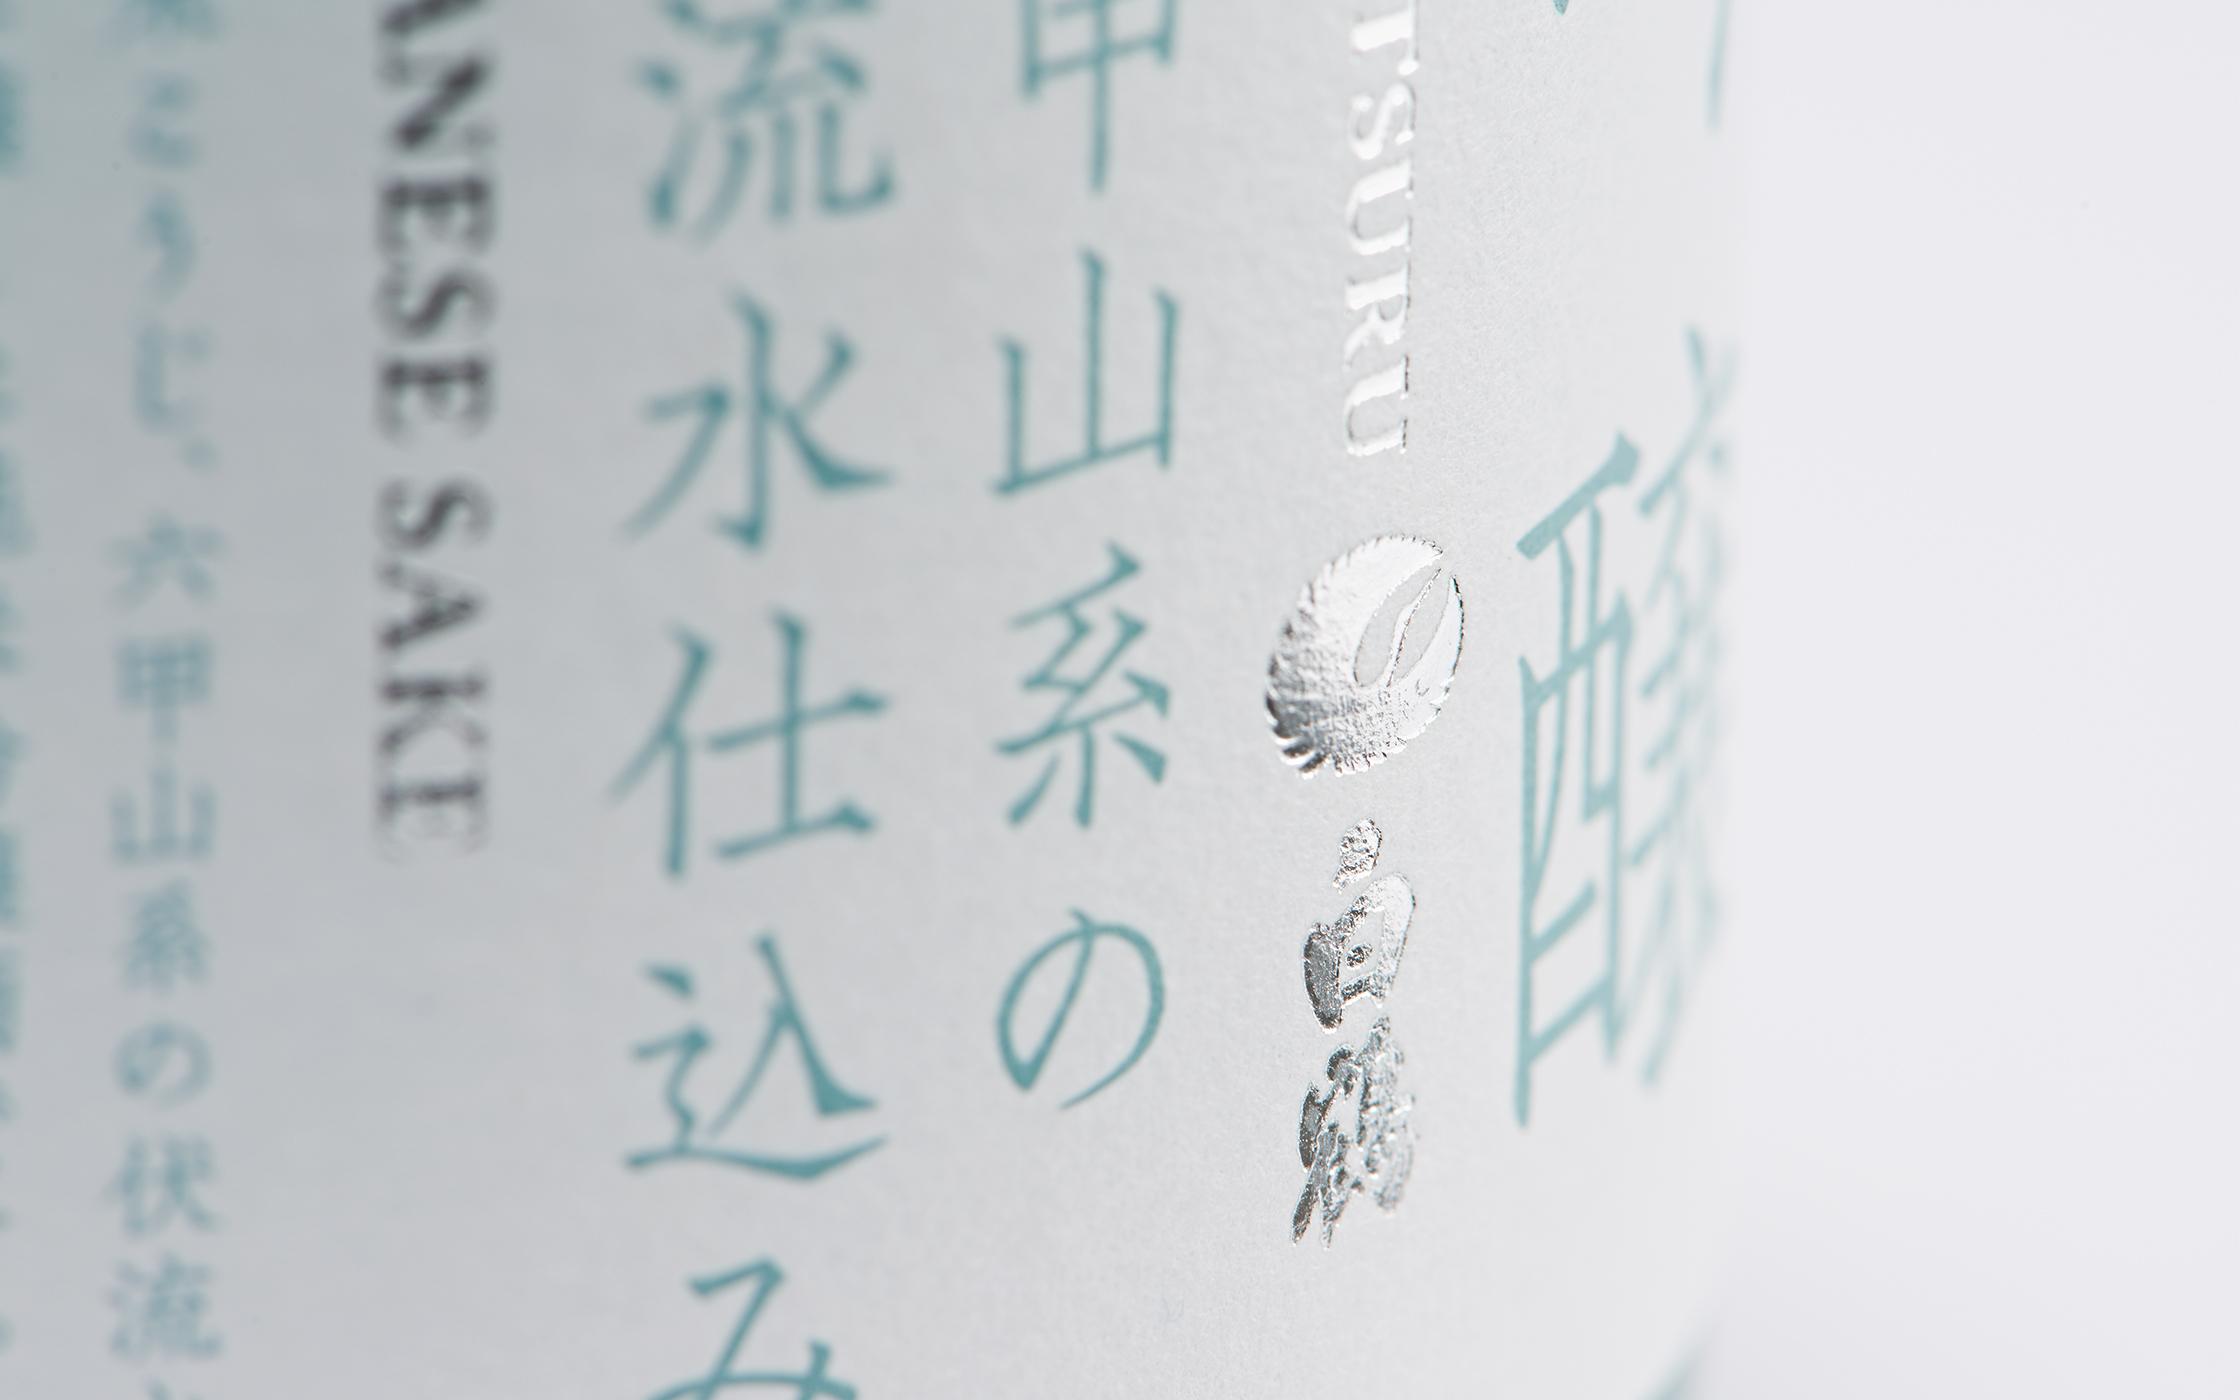 特撰 白鶴 純米吟醸 六甲山系の伏流水仕込み